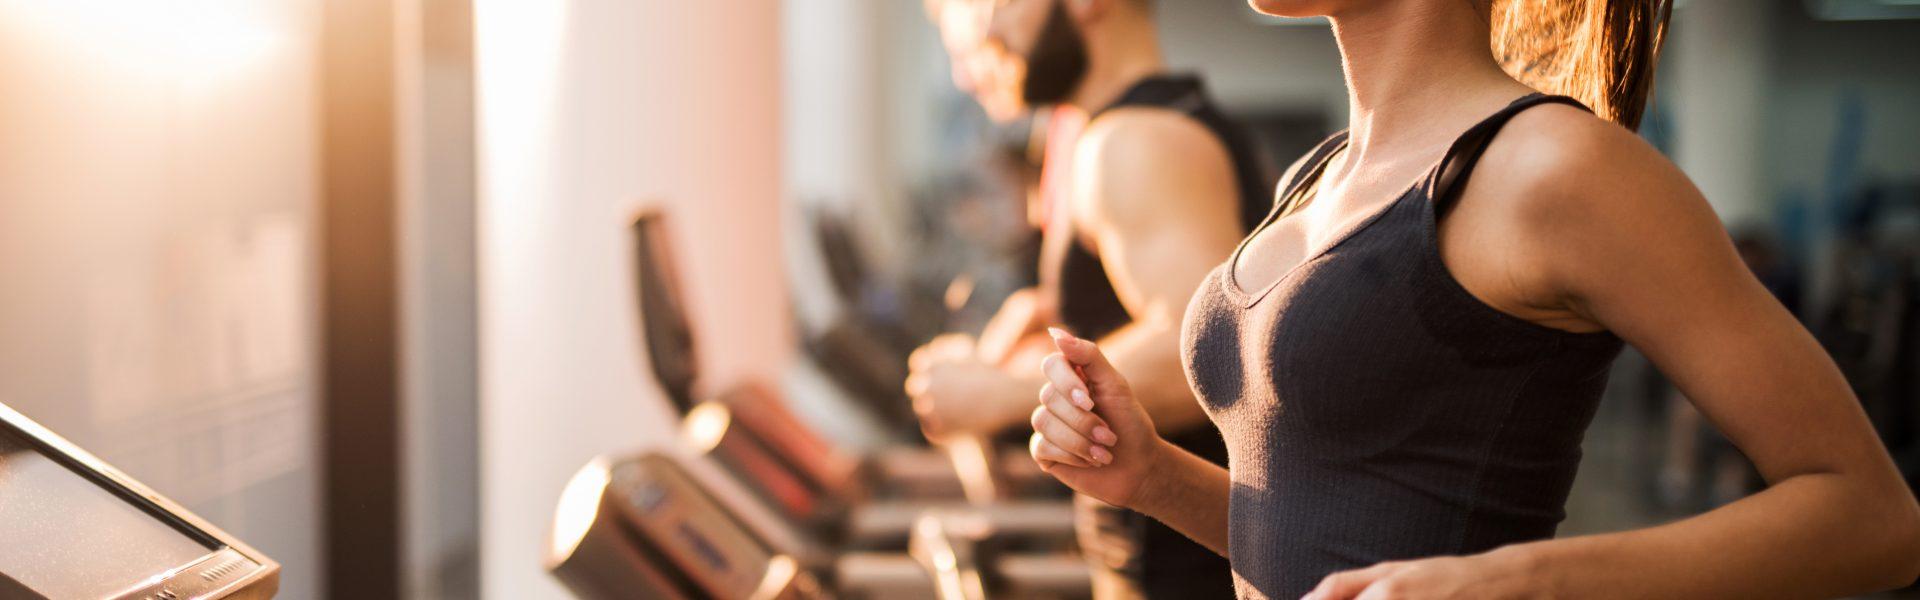 gyms in scottsdale az